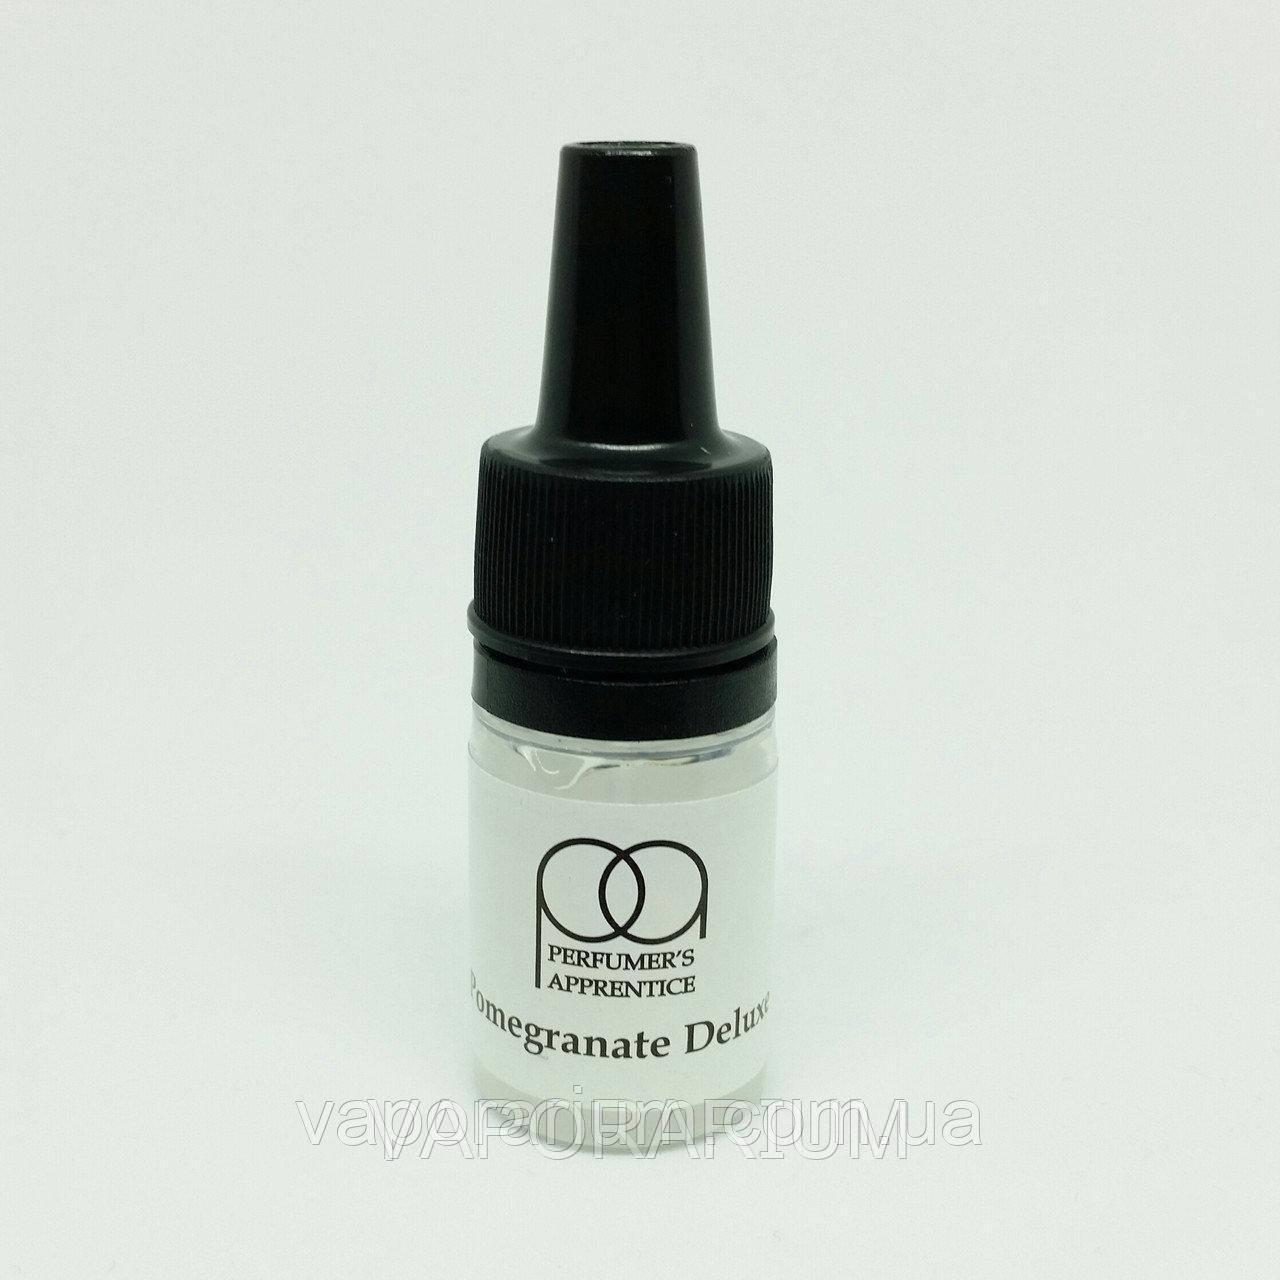 Ароматизатор TPA Pomegranate Deluxe (Гранат (Делюкс)) 10 мл (0045)